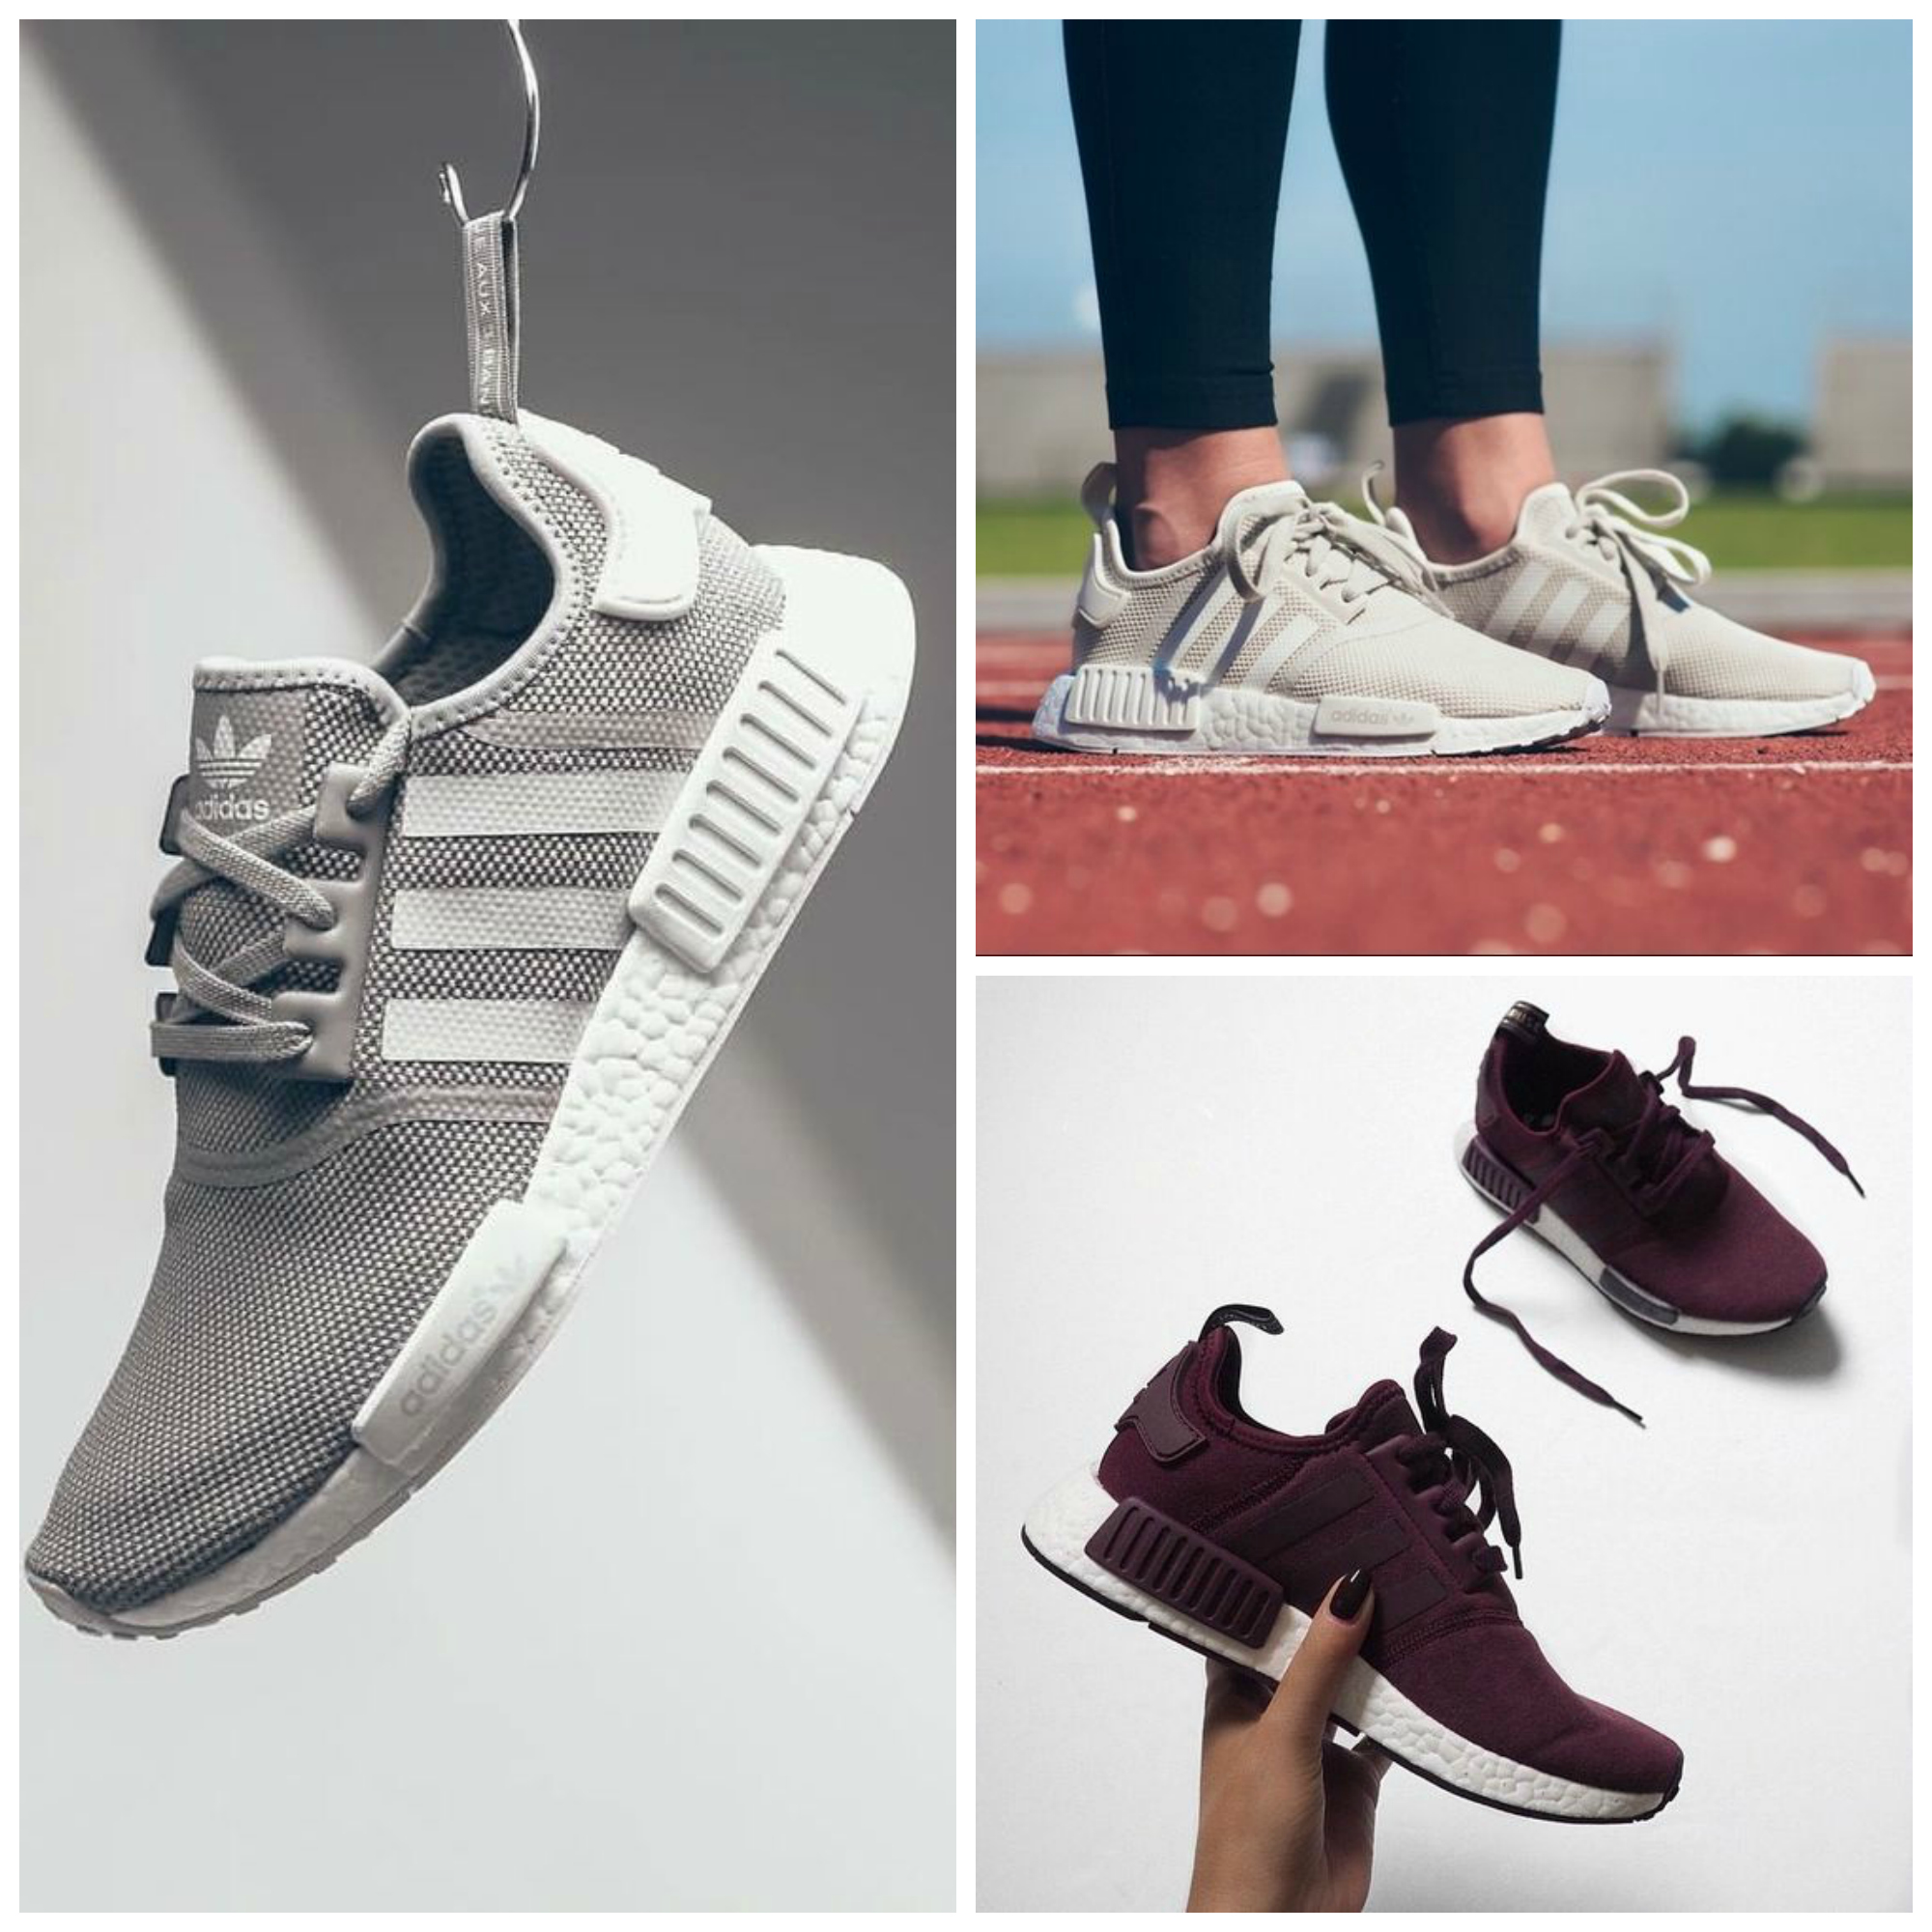 adidas_nmd_r1_runner